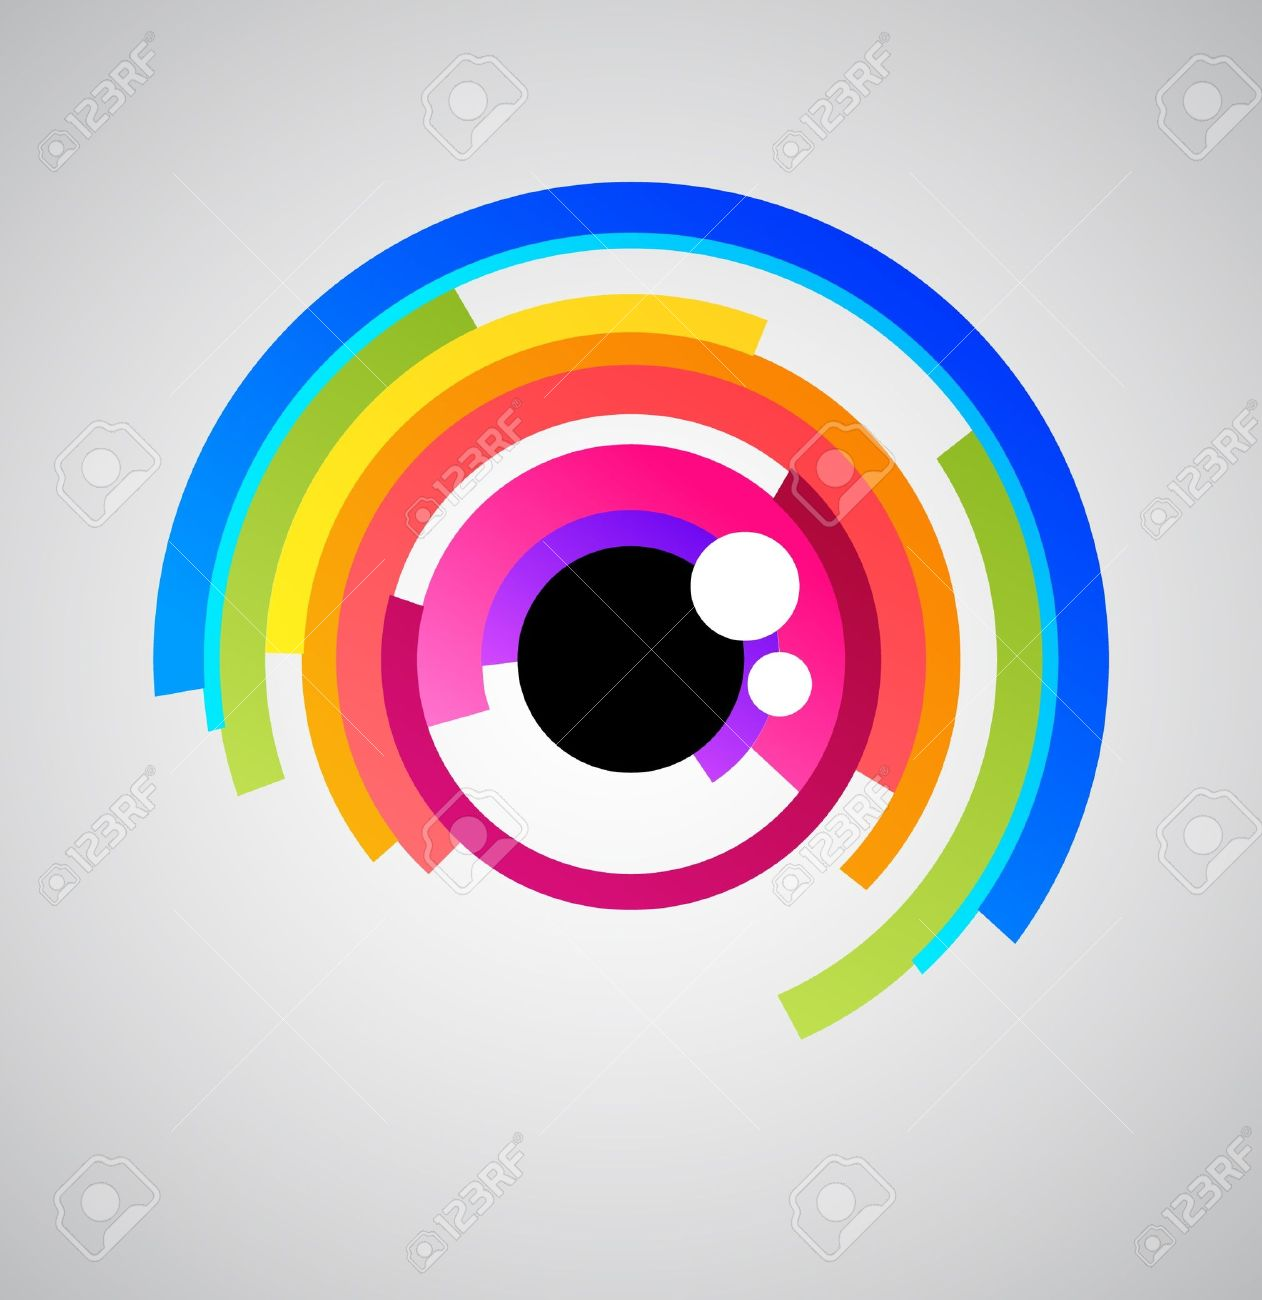 Abstract eye icon Stock Photo - 9103980